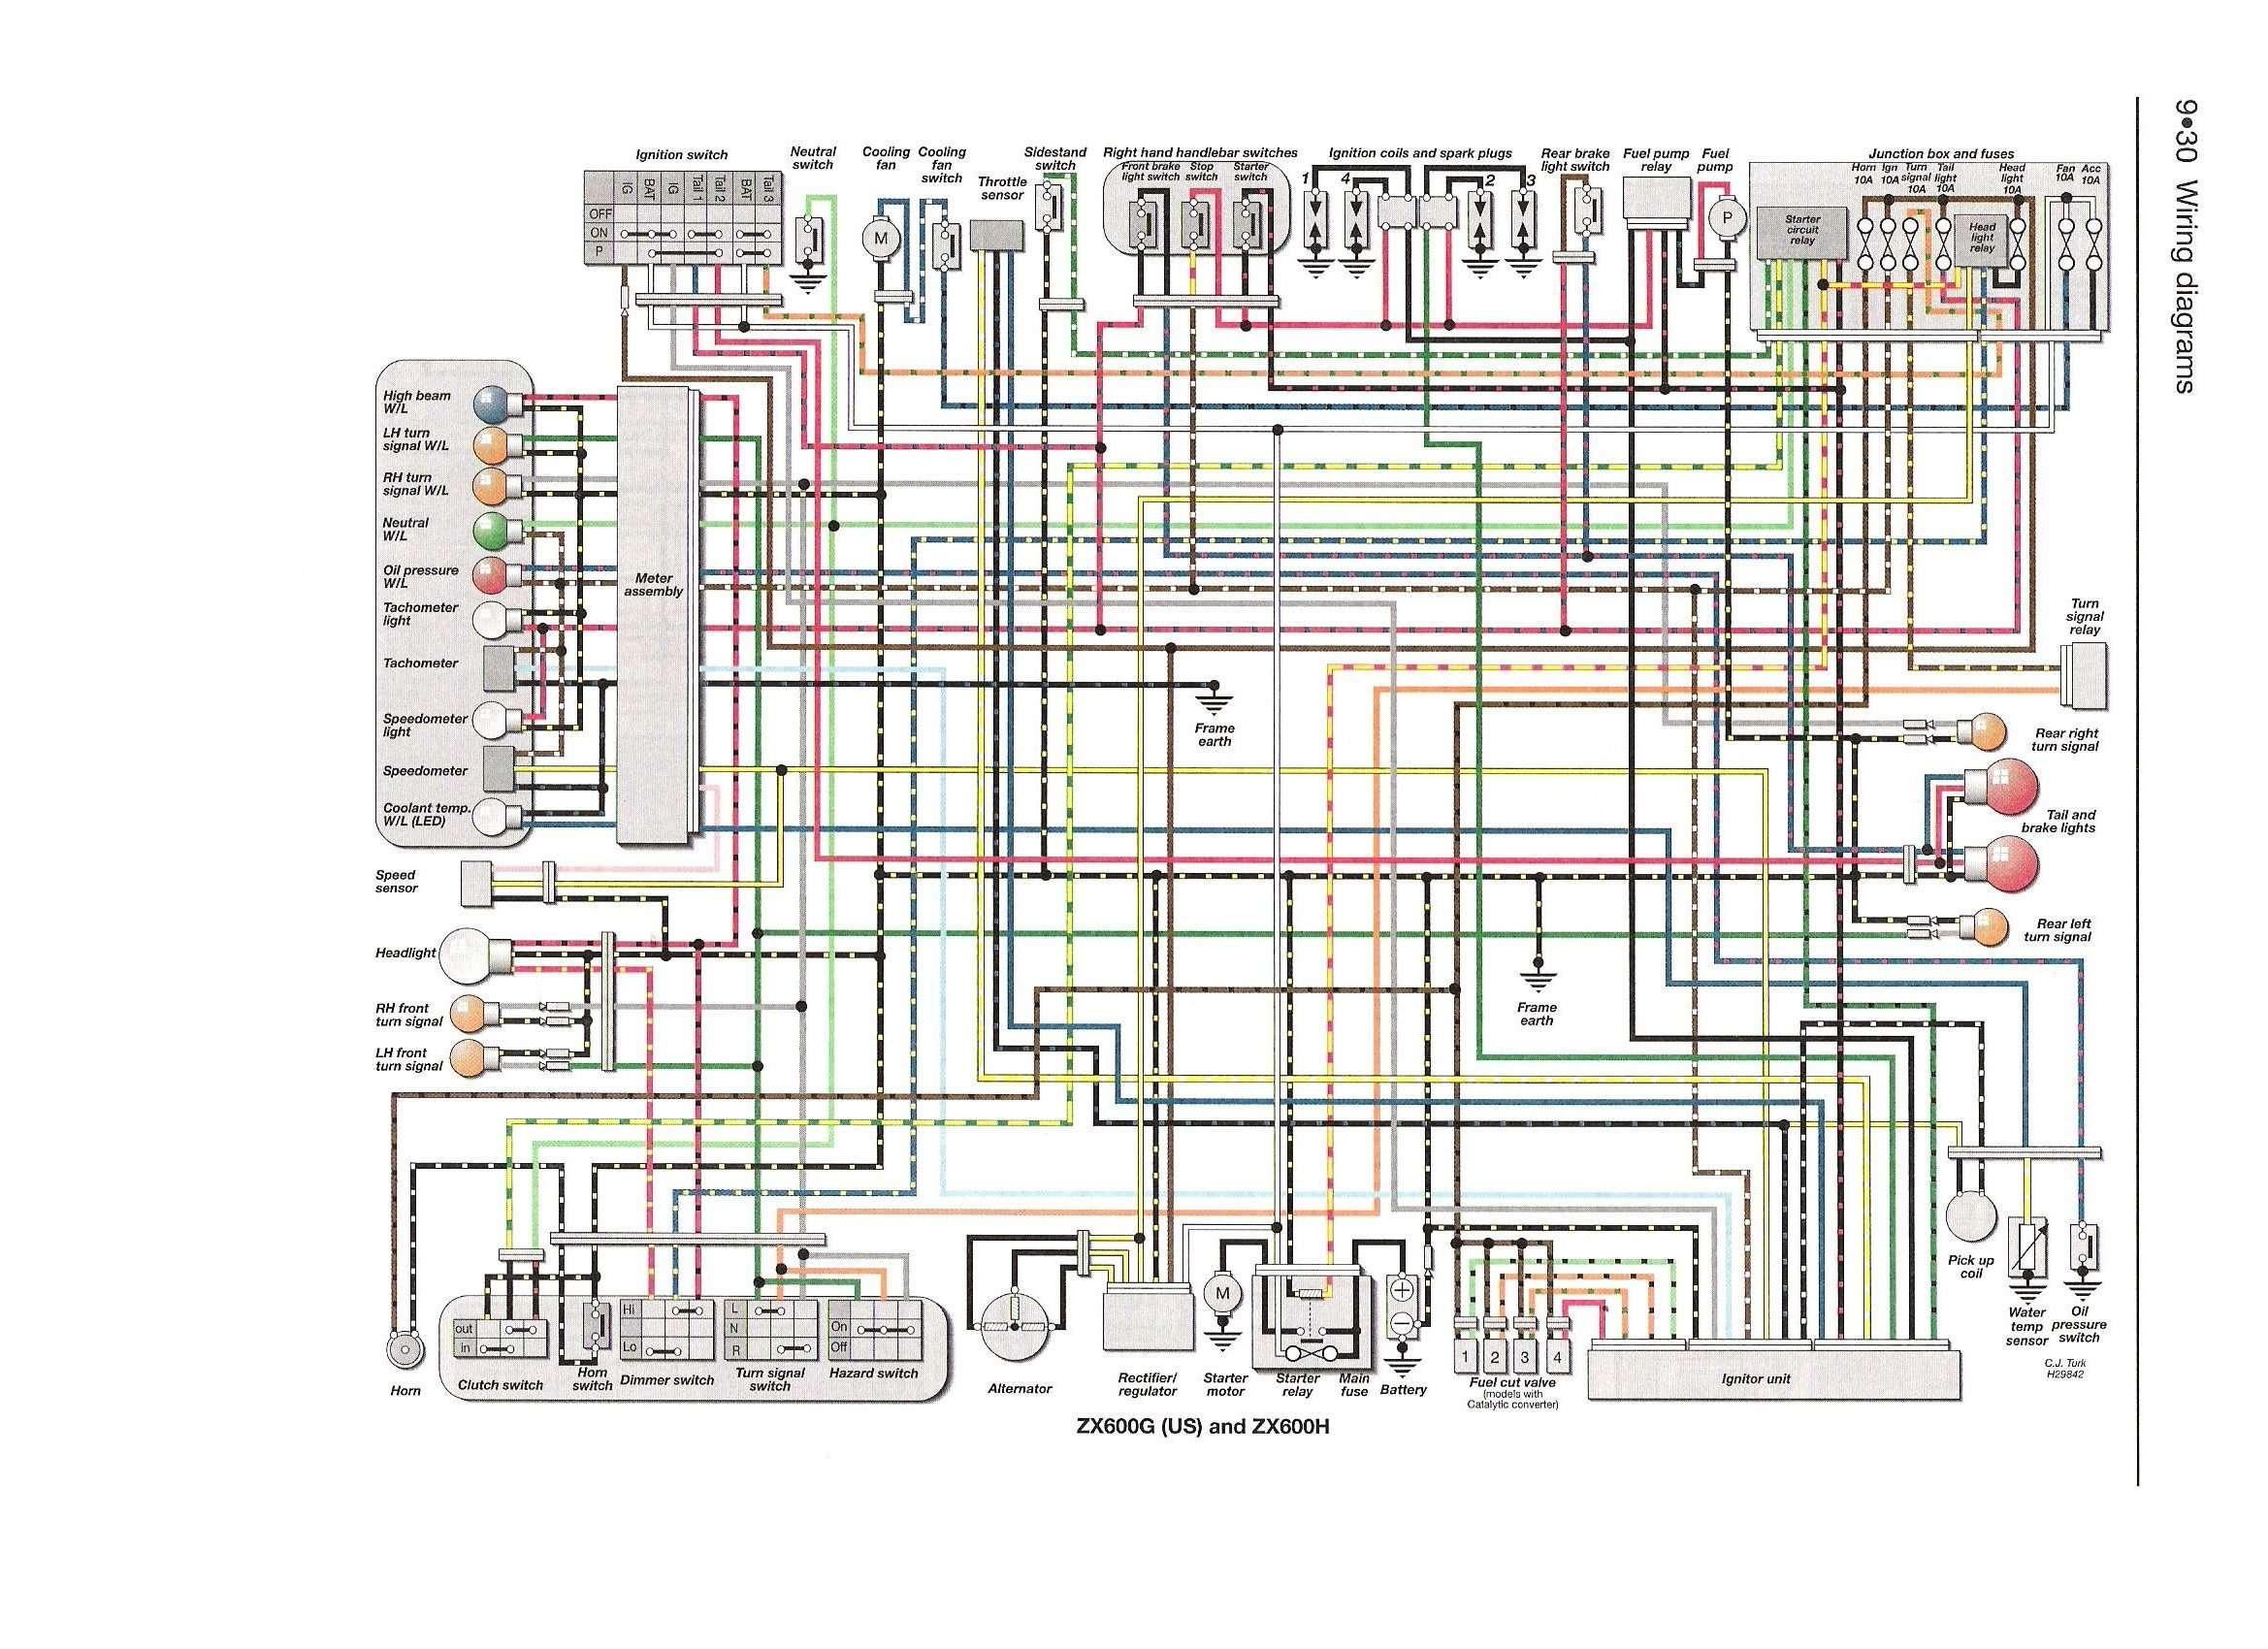 2006 Kawasaki Zx6r Wiring   Wiring Diagram on